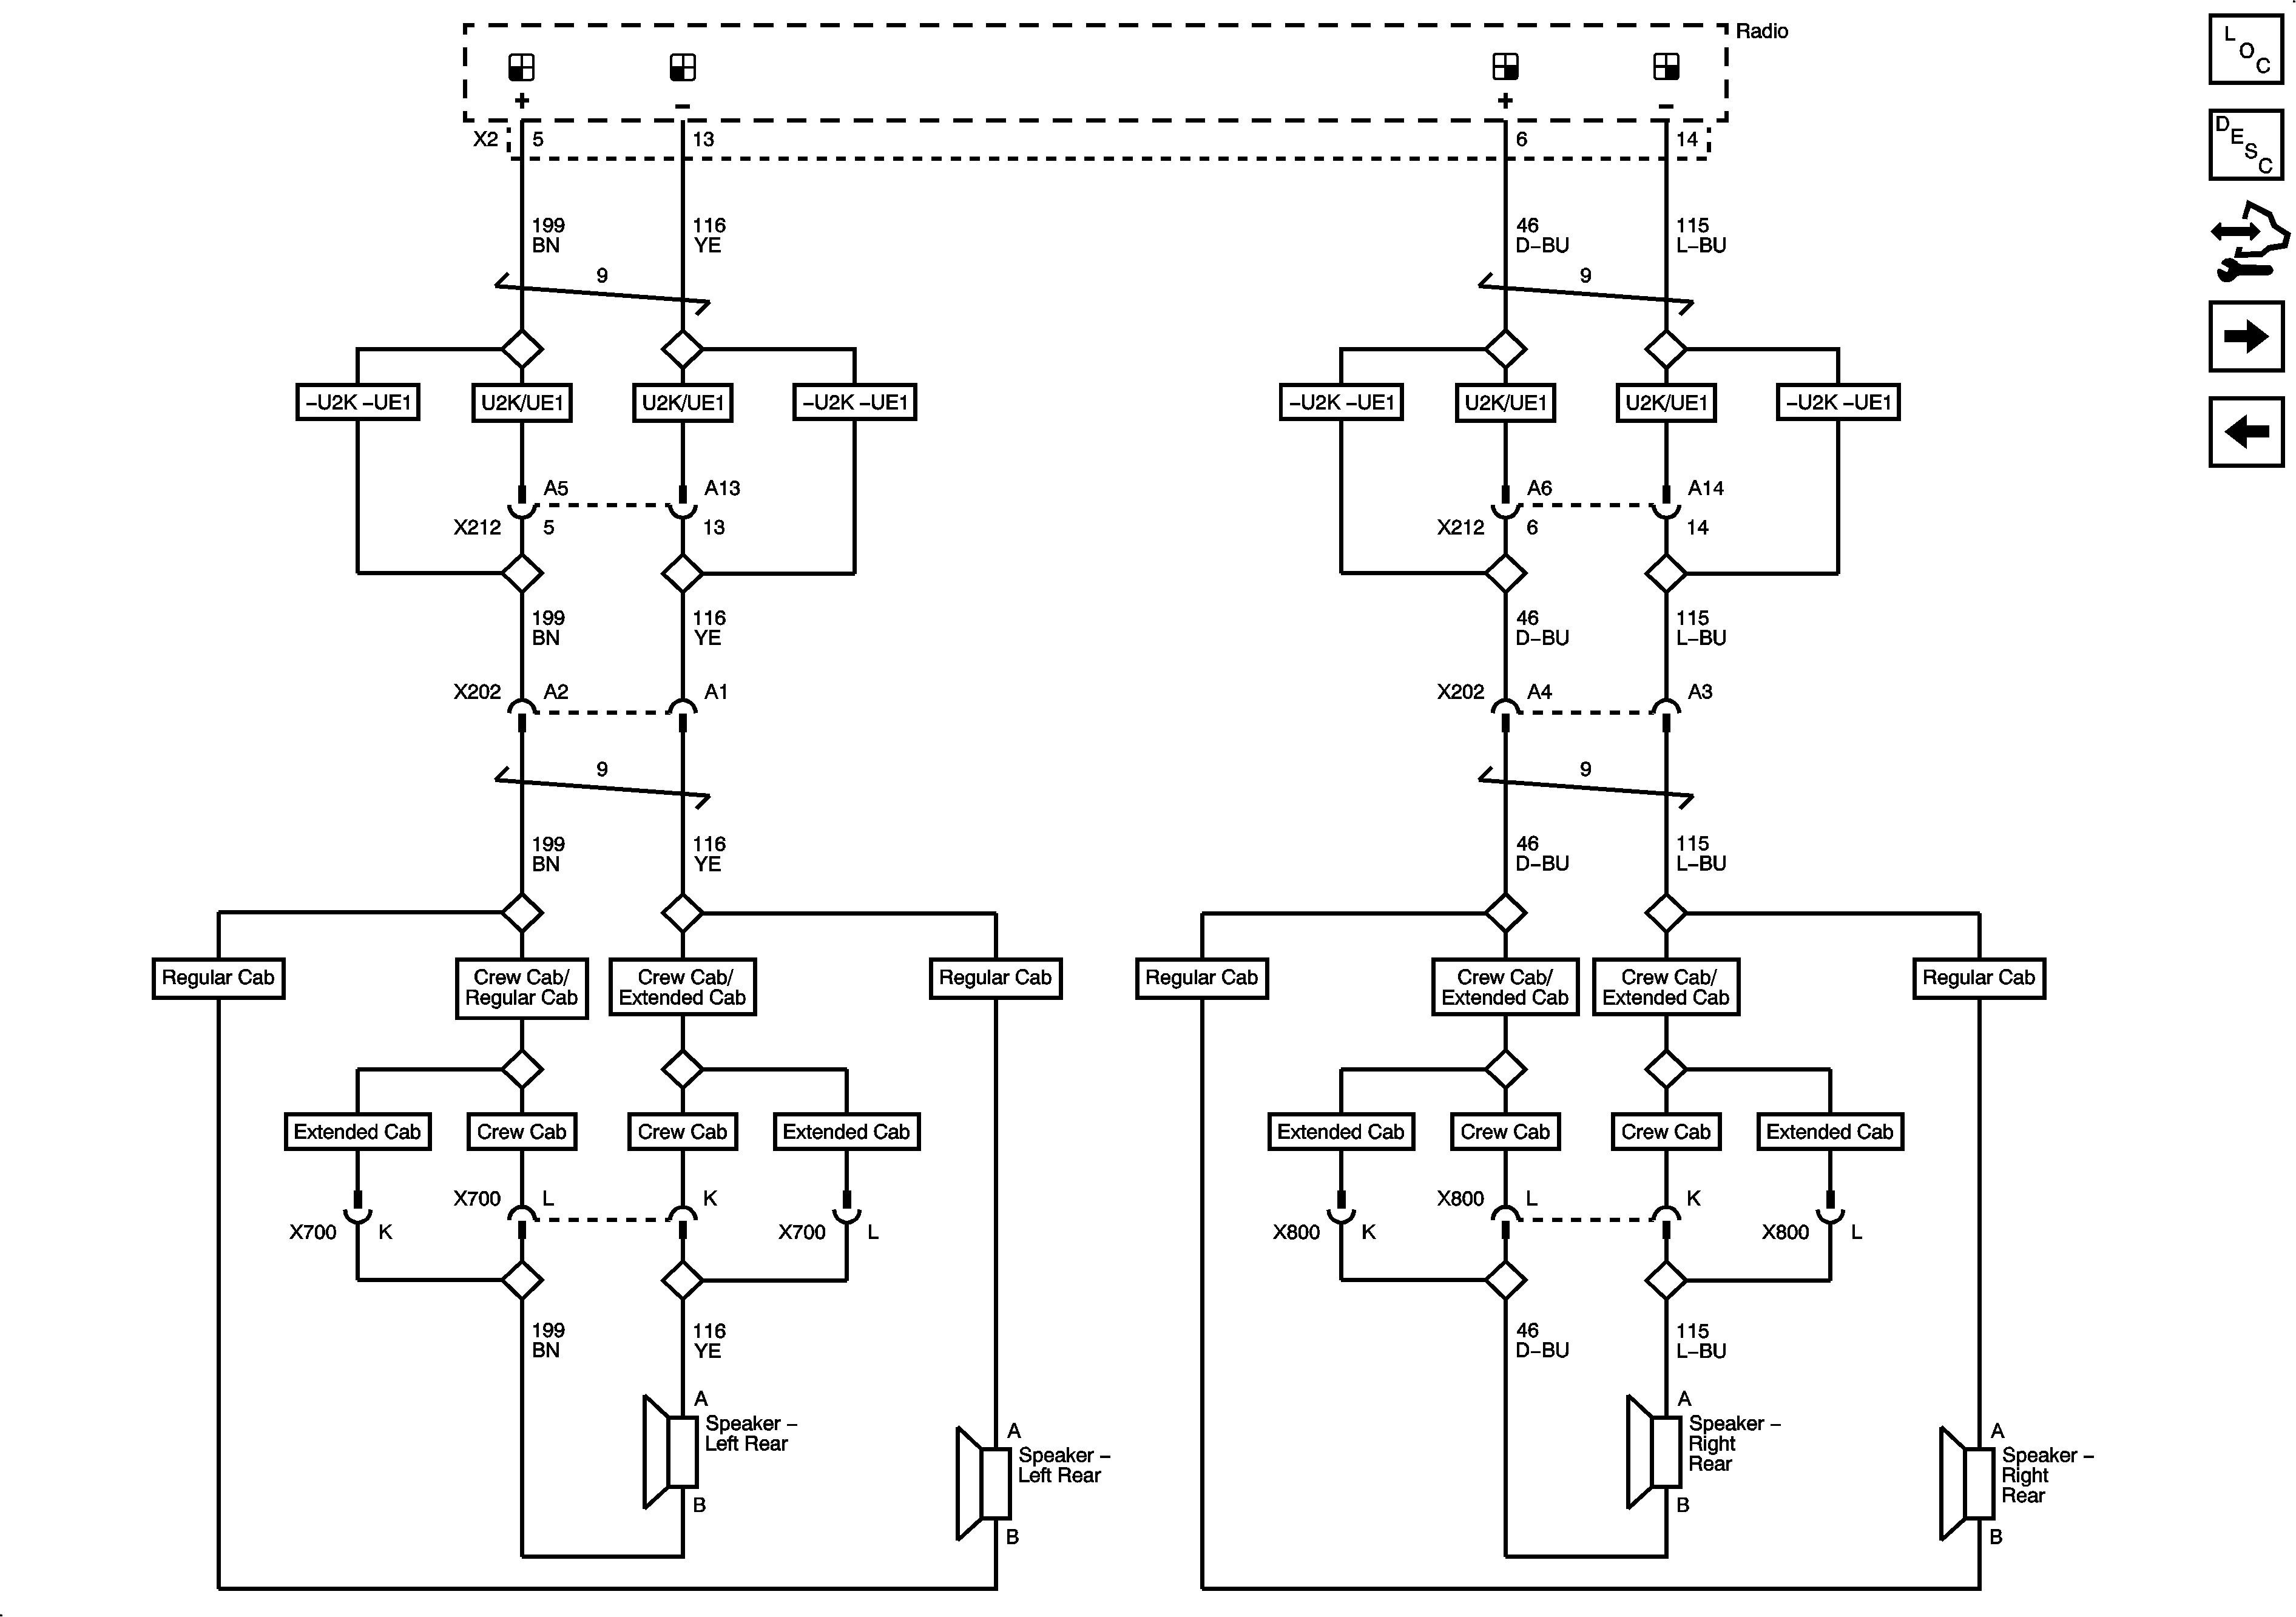 2007 Chevy Silverado Classic Radio Wiring Diagram Valid 2001 - 2007 Chevy Silverado Radio Wiring Harness Diagram